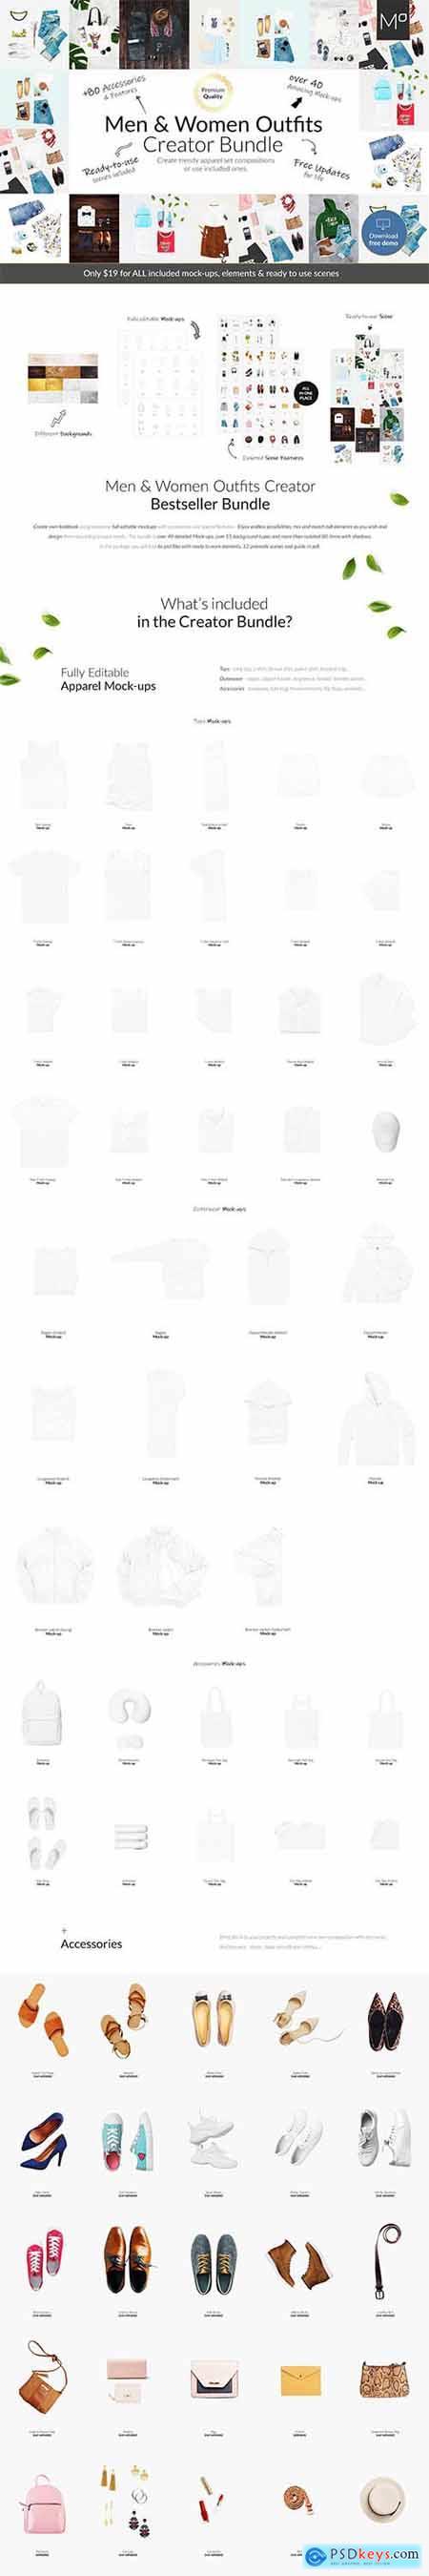 Men & Women Outfit Creator Bundle 4519215